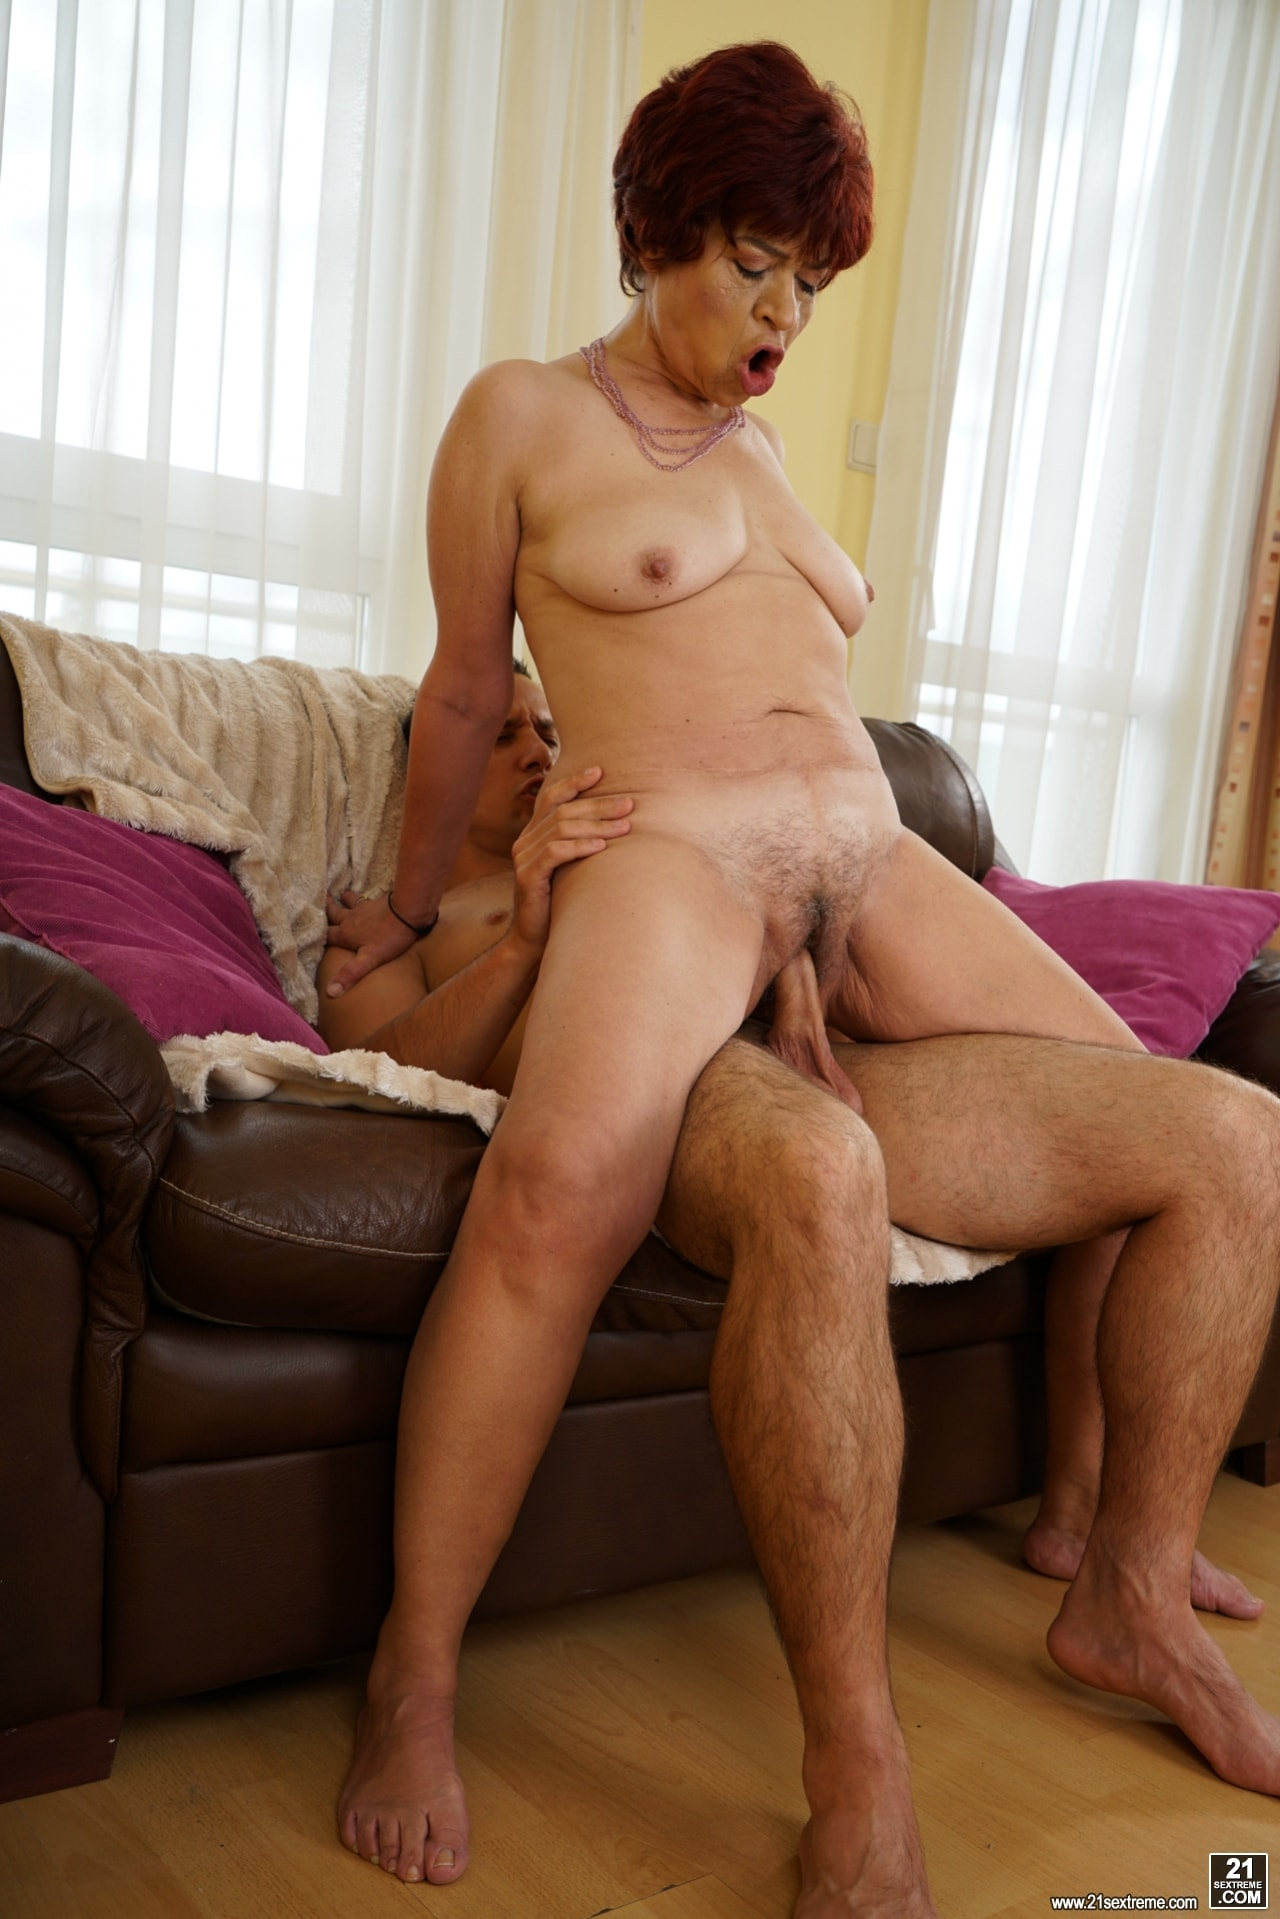 21Sextury 'A Taste of Experience' starring Donatella (Photo 228)